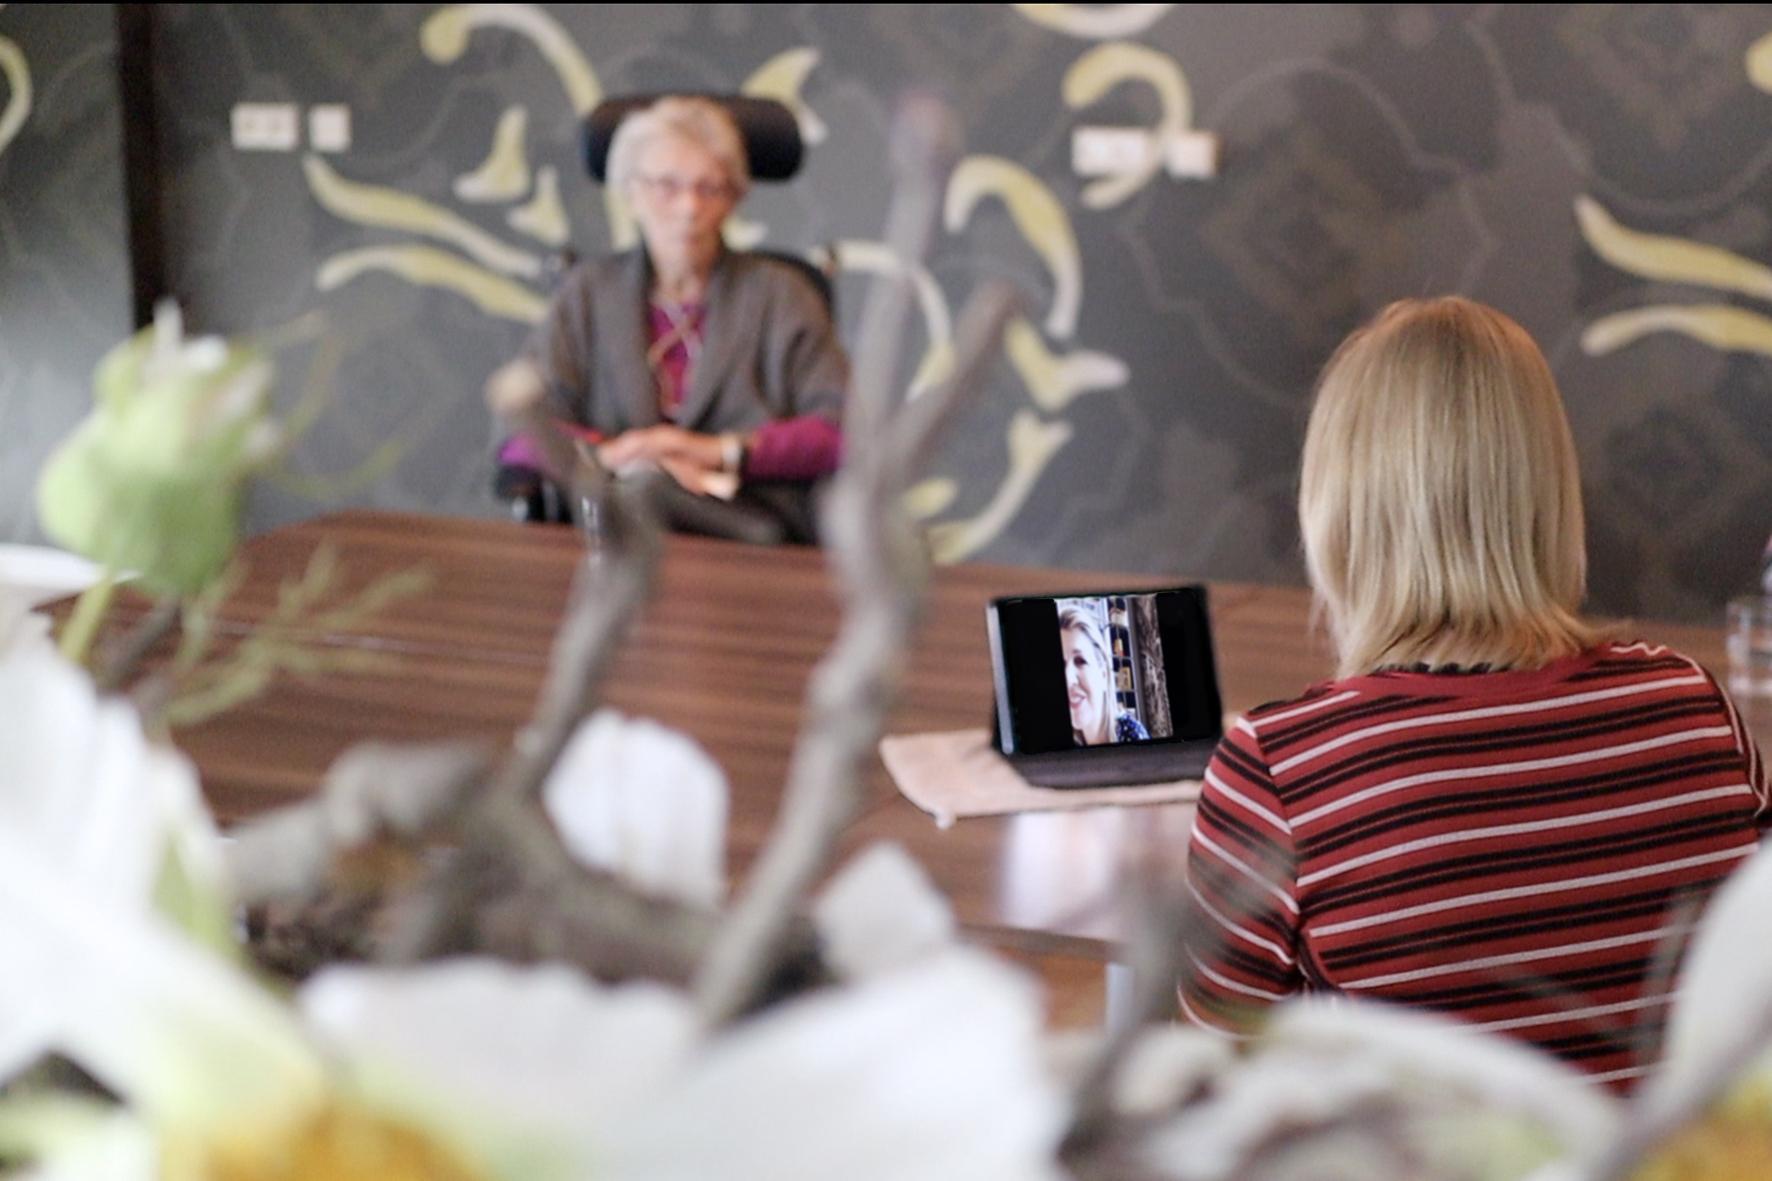 Koningin komt in beeld in Nicolaas verpleeghuis Lutjebroek: 'Je wupt er wel van op'